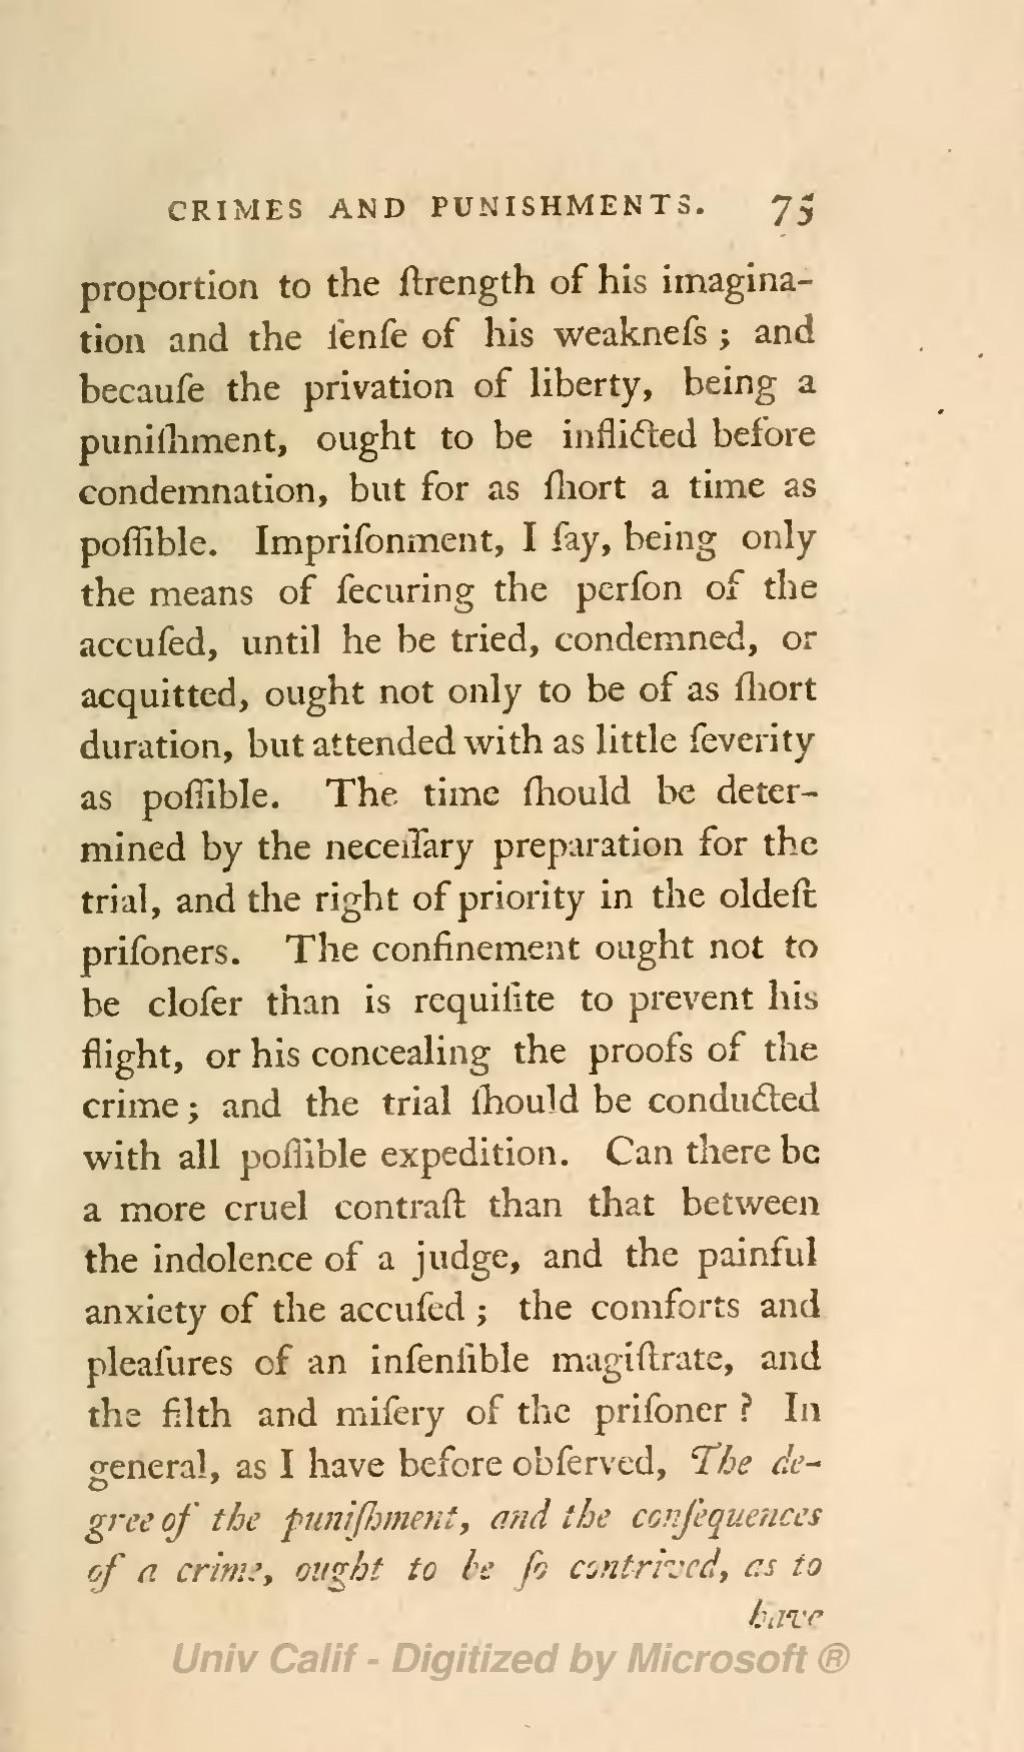 018 Page87 1024px Essay On Crimes Ands 1775 Djvu Example Crime And Wondrous Punishment Outline Pdf Ielts Large